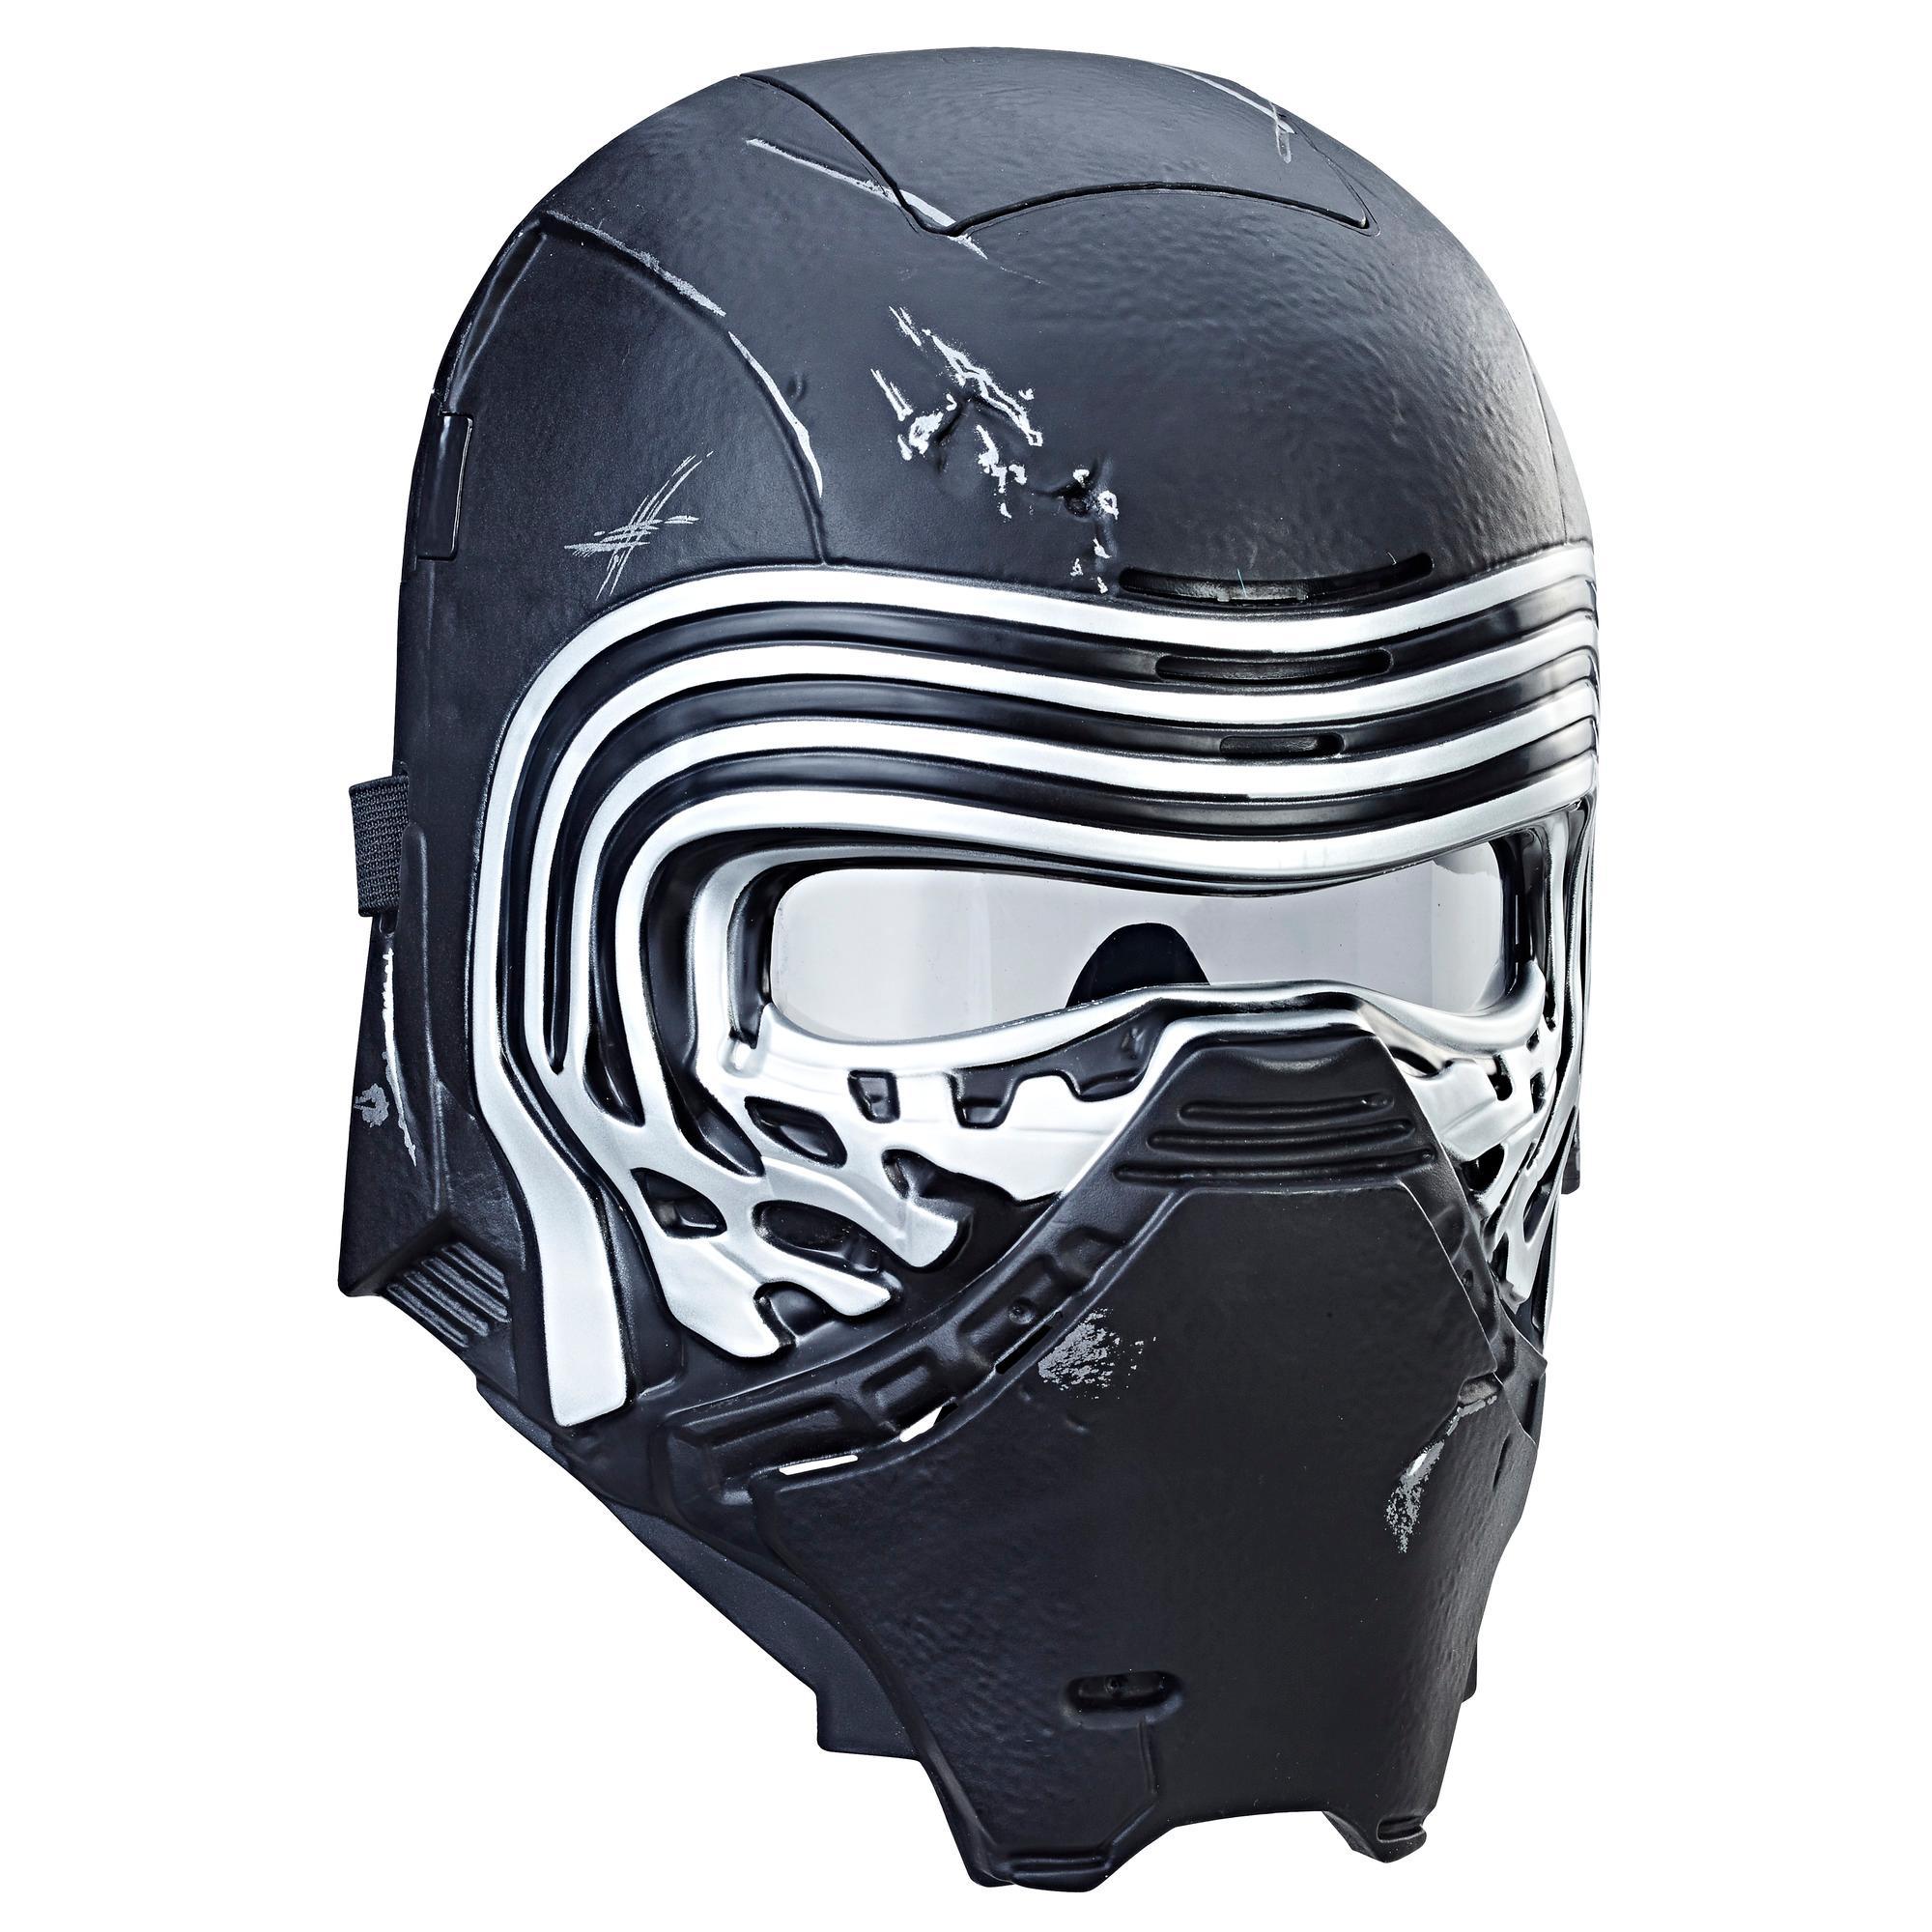 Star Wars: Os Últimos Jedi - máscara eletrônica de Kylo Ren